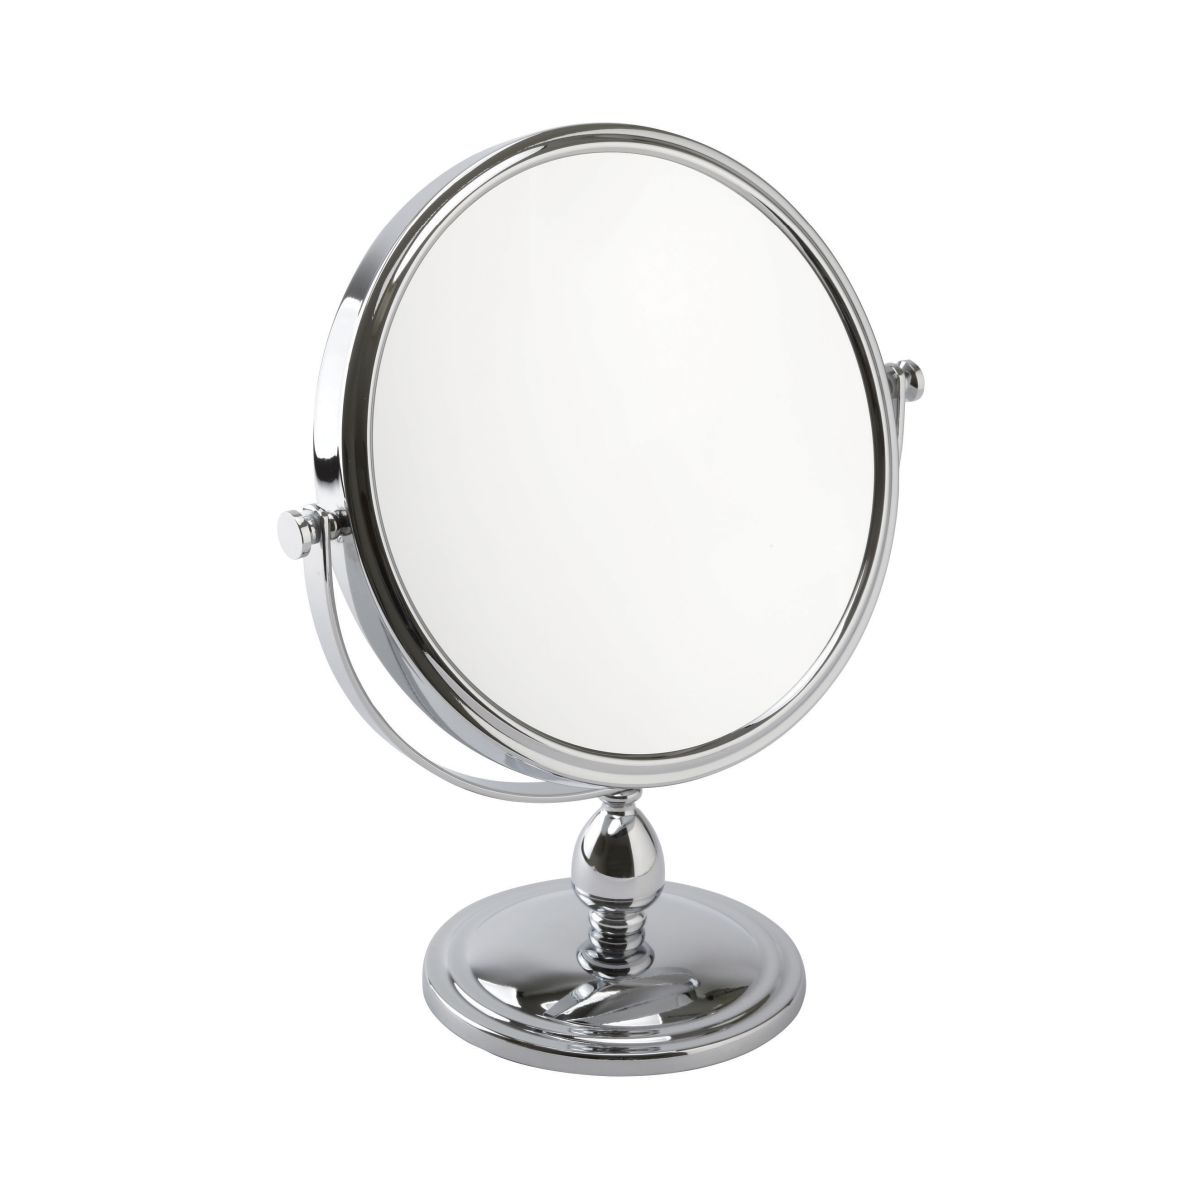 1093 20 new 1 - 10x Magnification Pedestal Mirror - 1093/20CHR